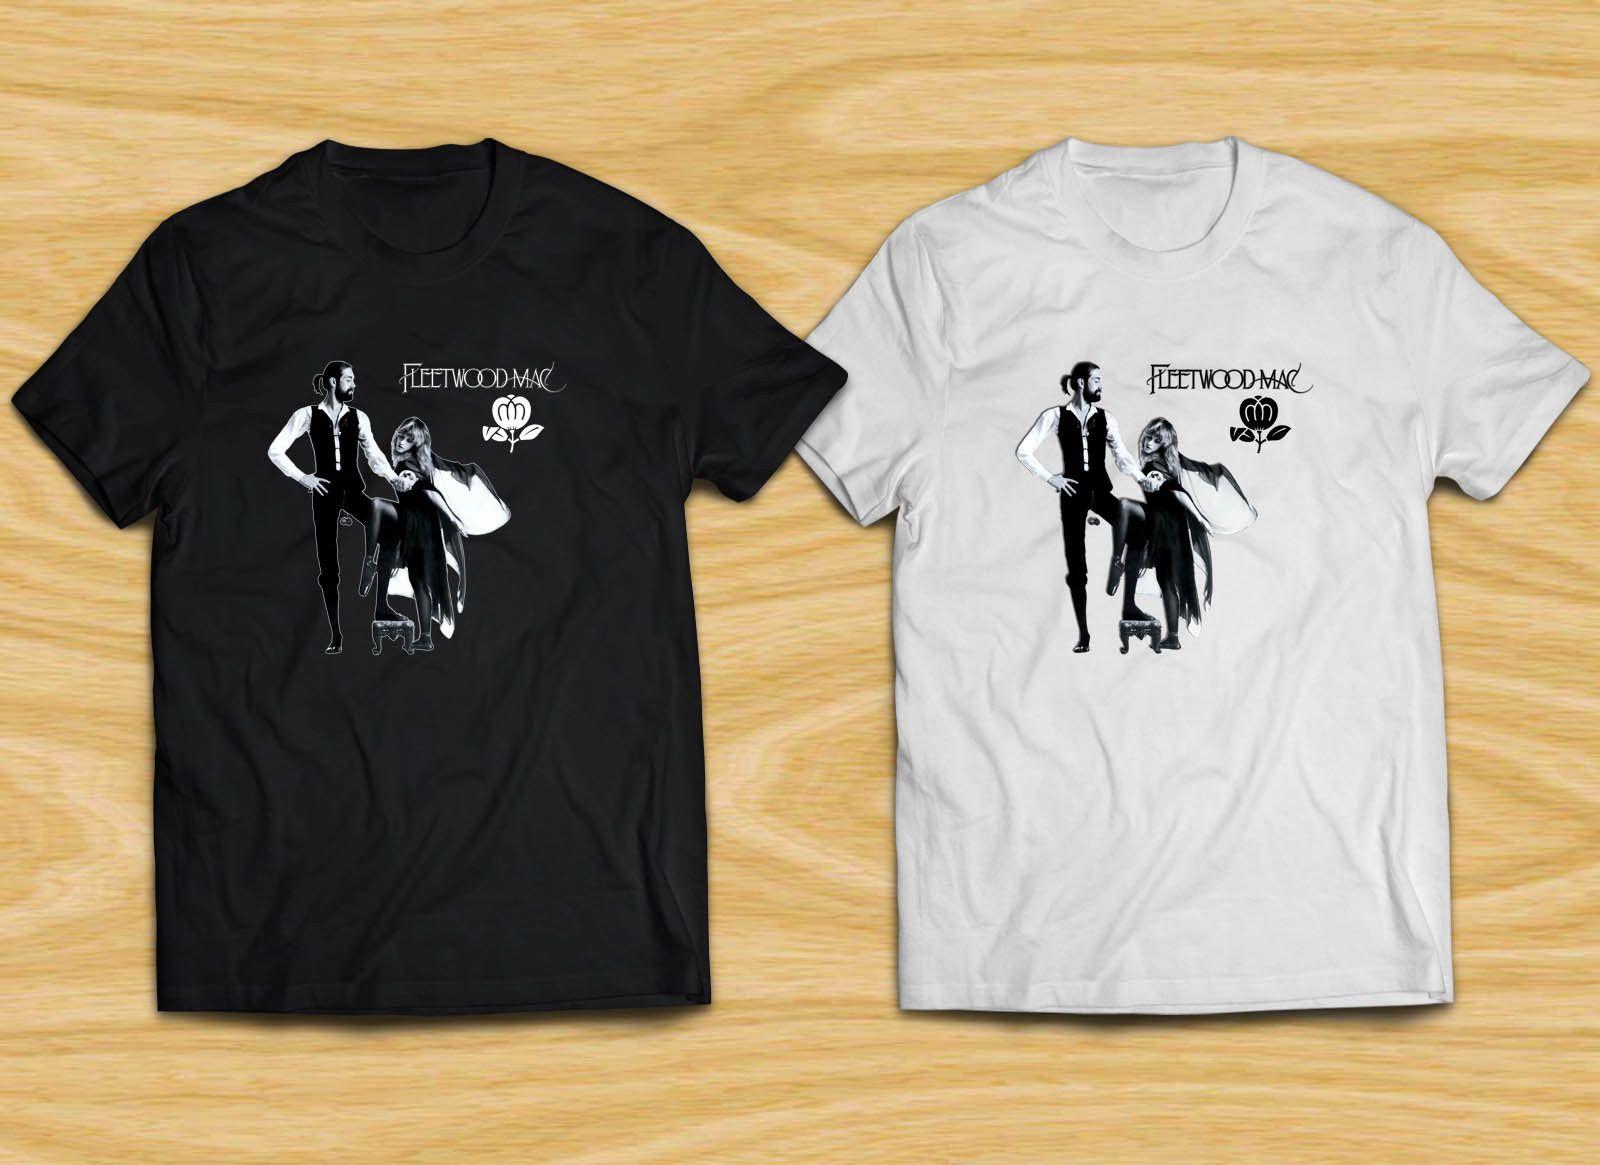 FleetWood Mac S M L XL Short Sleeves Black T-Shirt